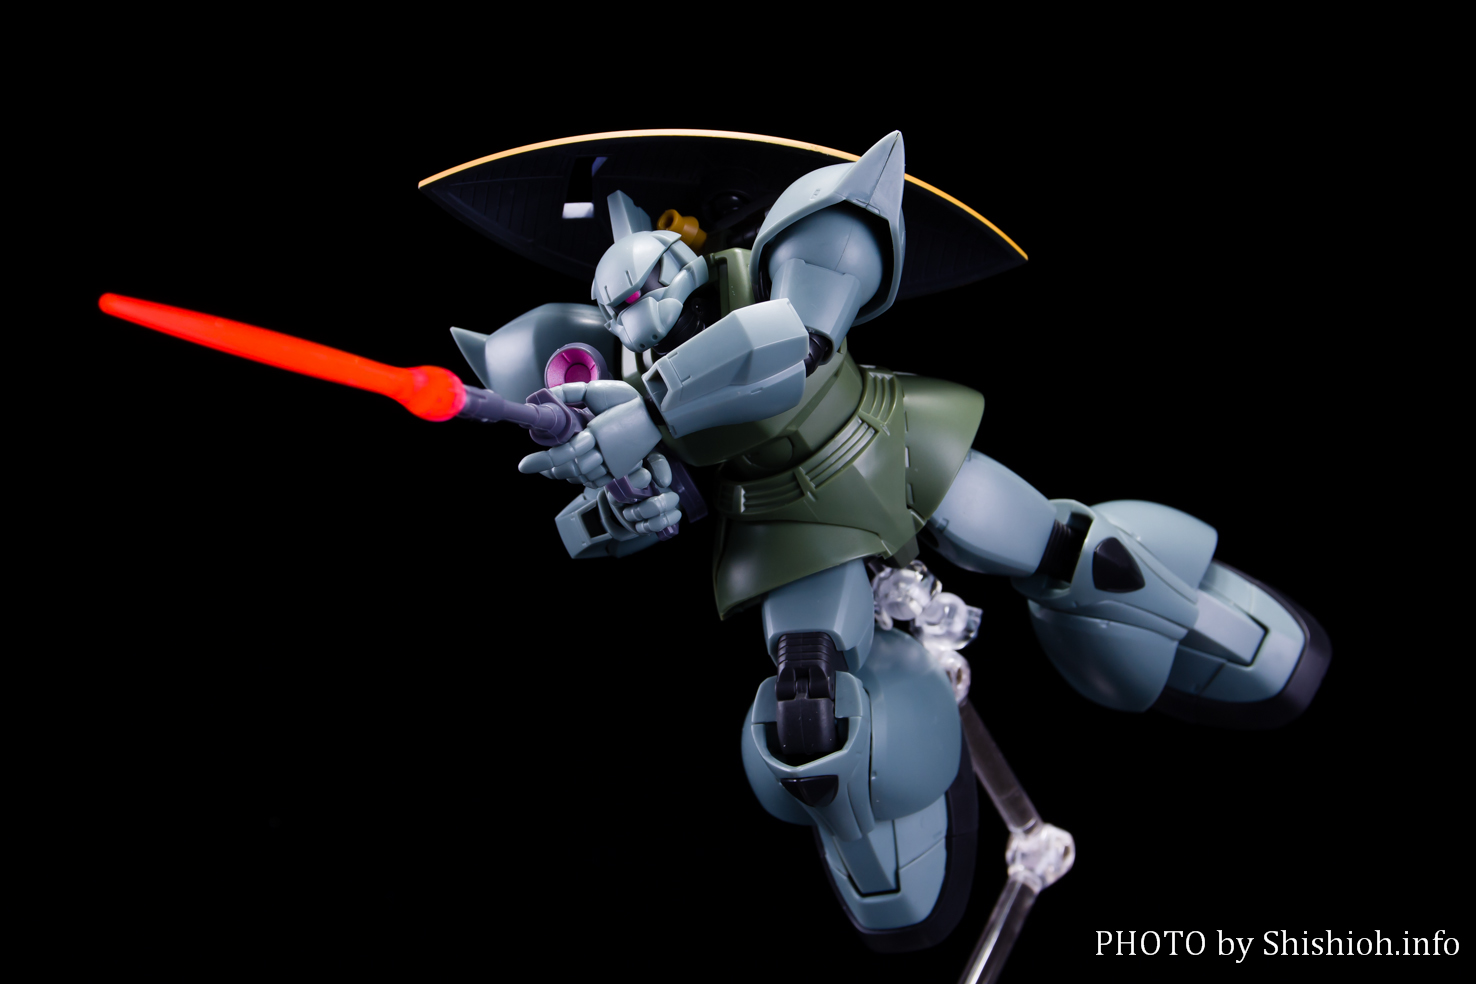 Gundam - Metal Robot Side MS (Bandai) - Page 2 VDJI83UW_o